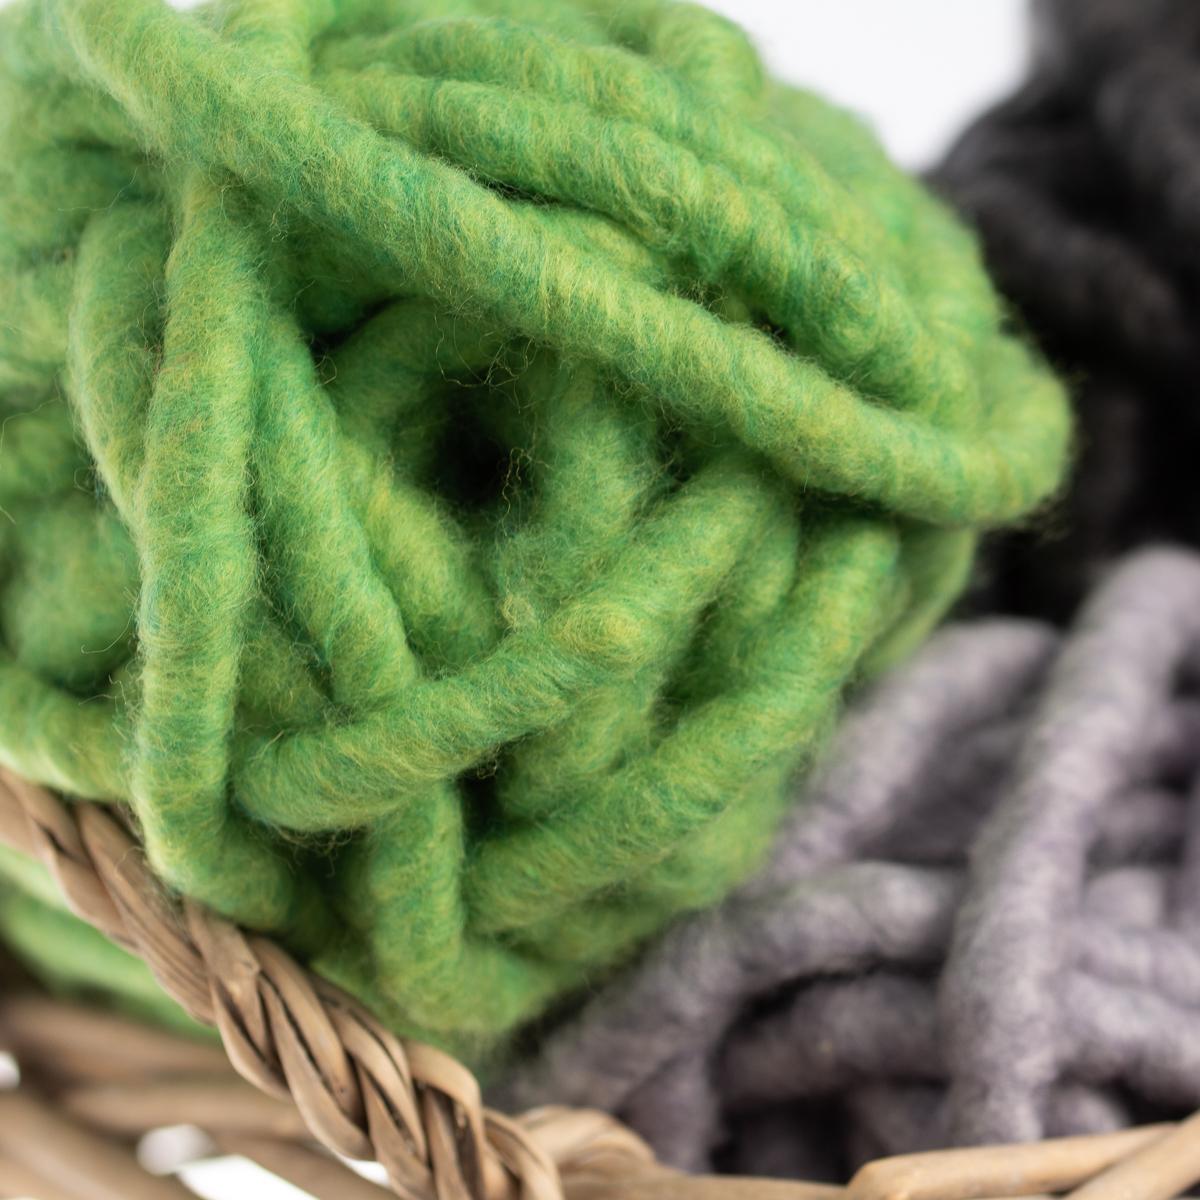 3pk-Lion-Brand-Wow-Acrylic-amp-Wool-yarn-Jumbo-7-Knitting-Crocheting-Skeins-Soft thumbnail 12